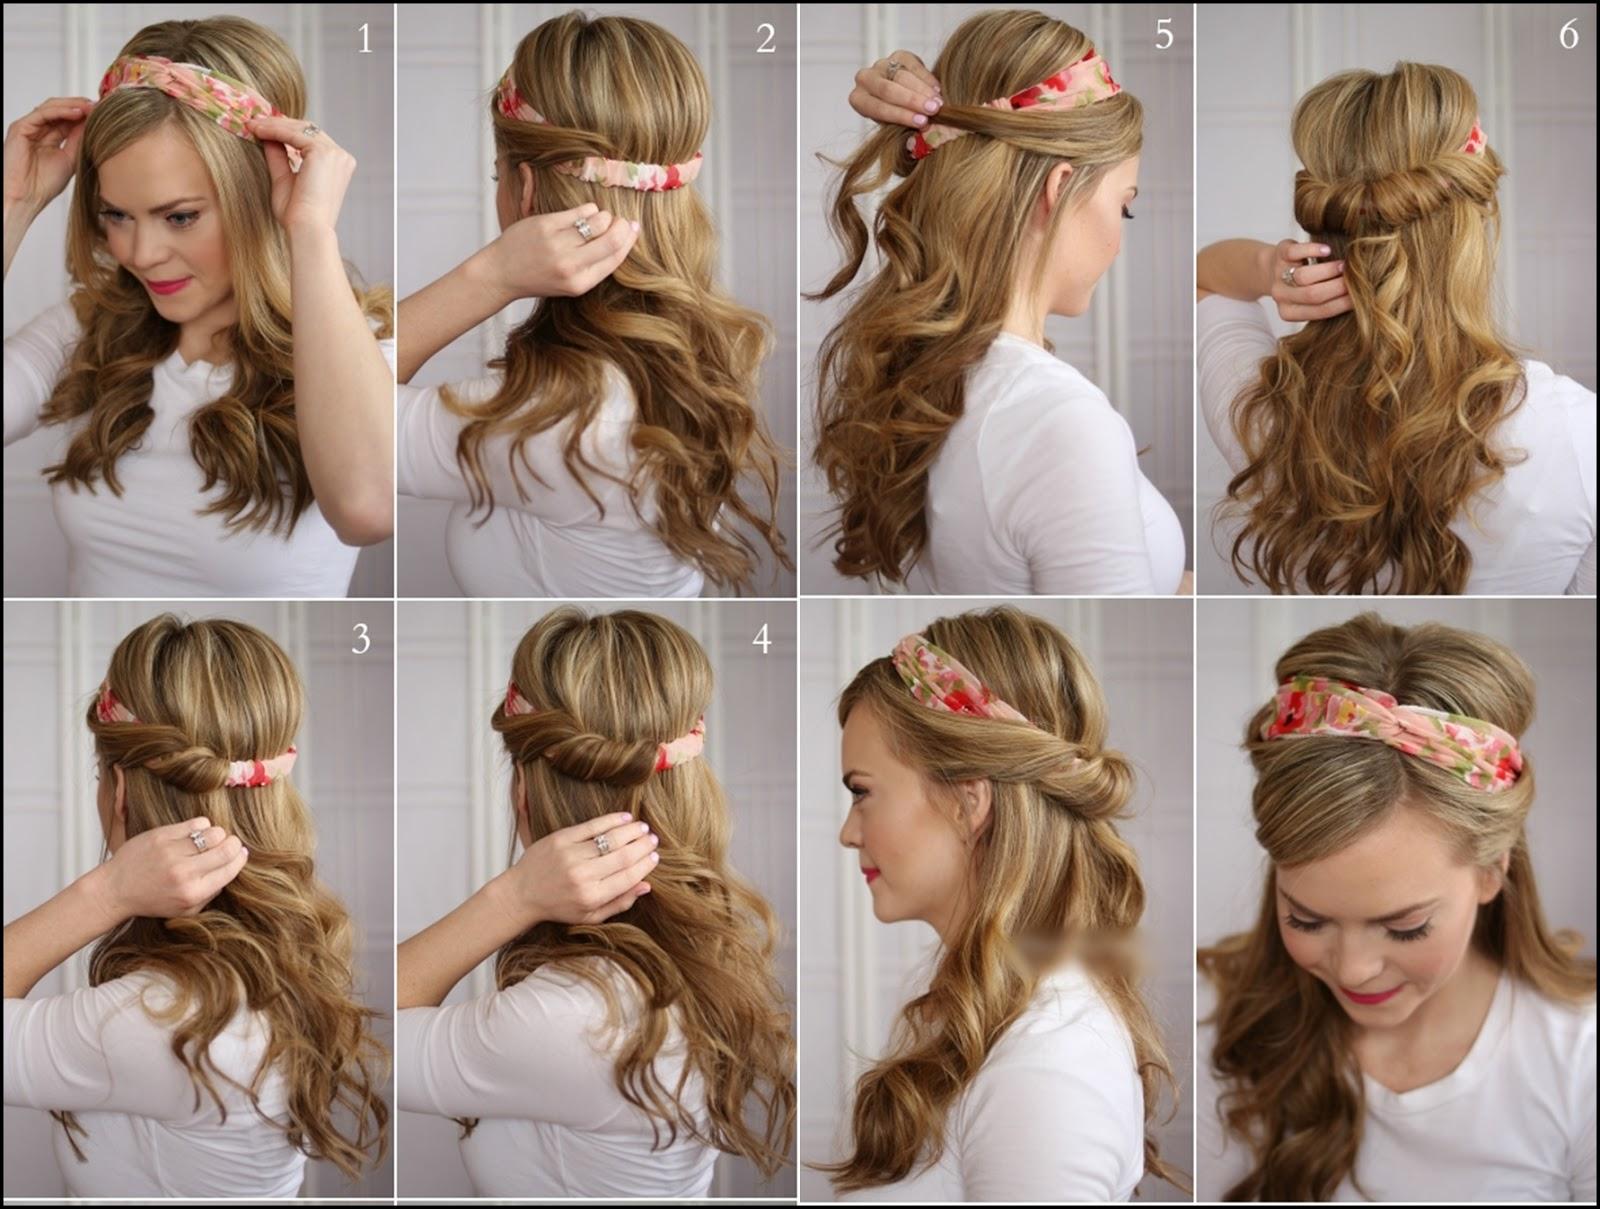 Gaya Rambut Simple Untuk Sekolah Geraistylish